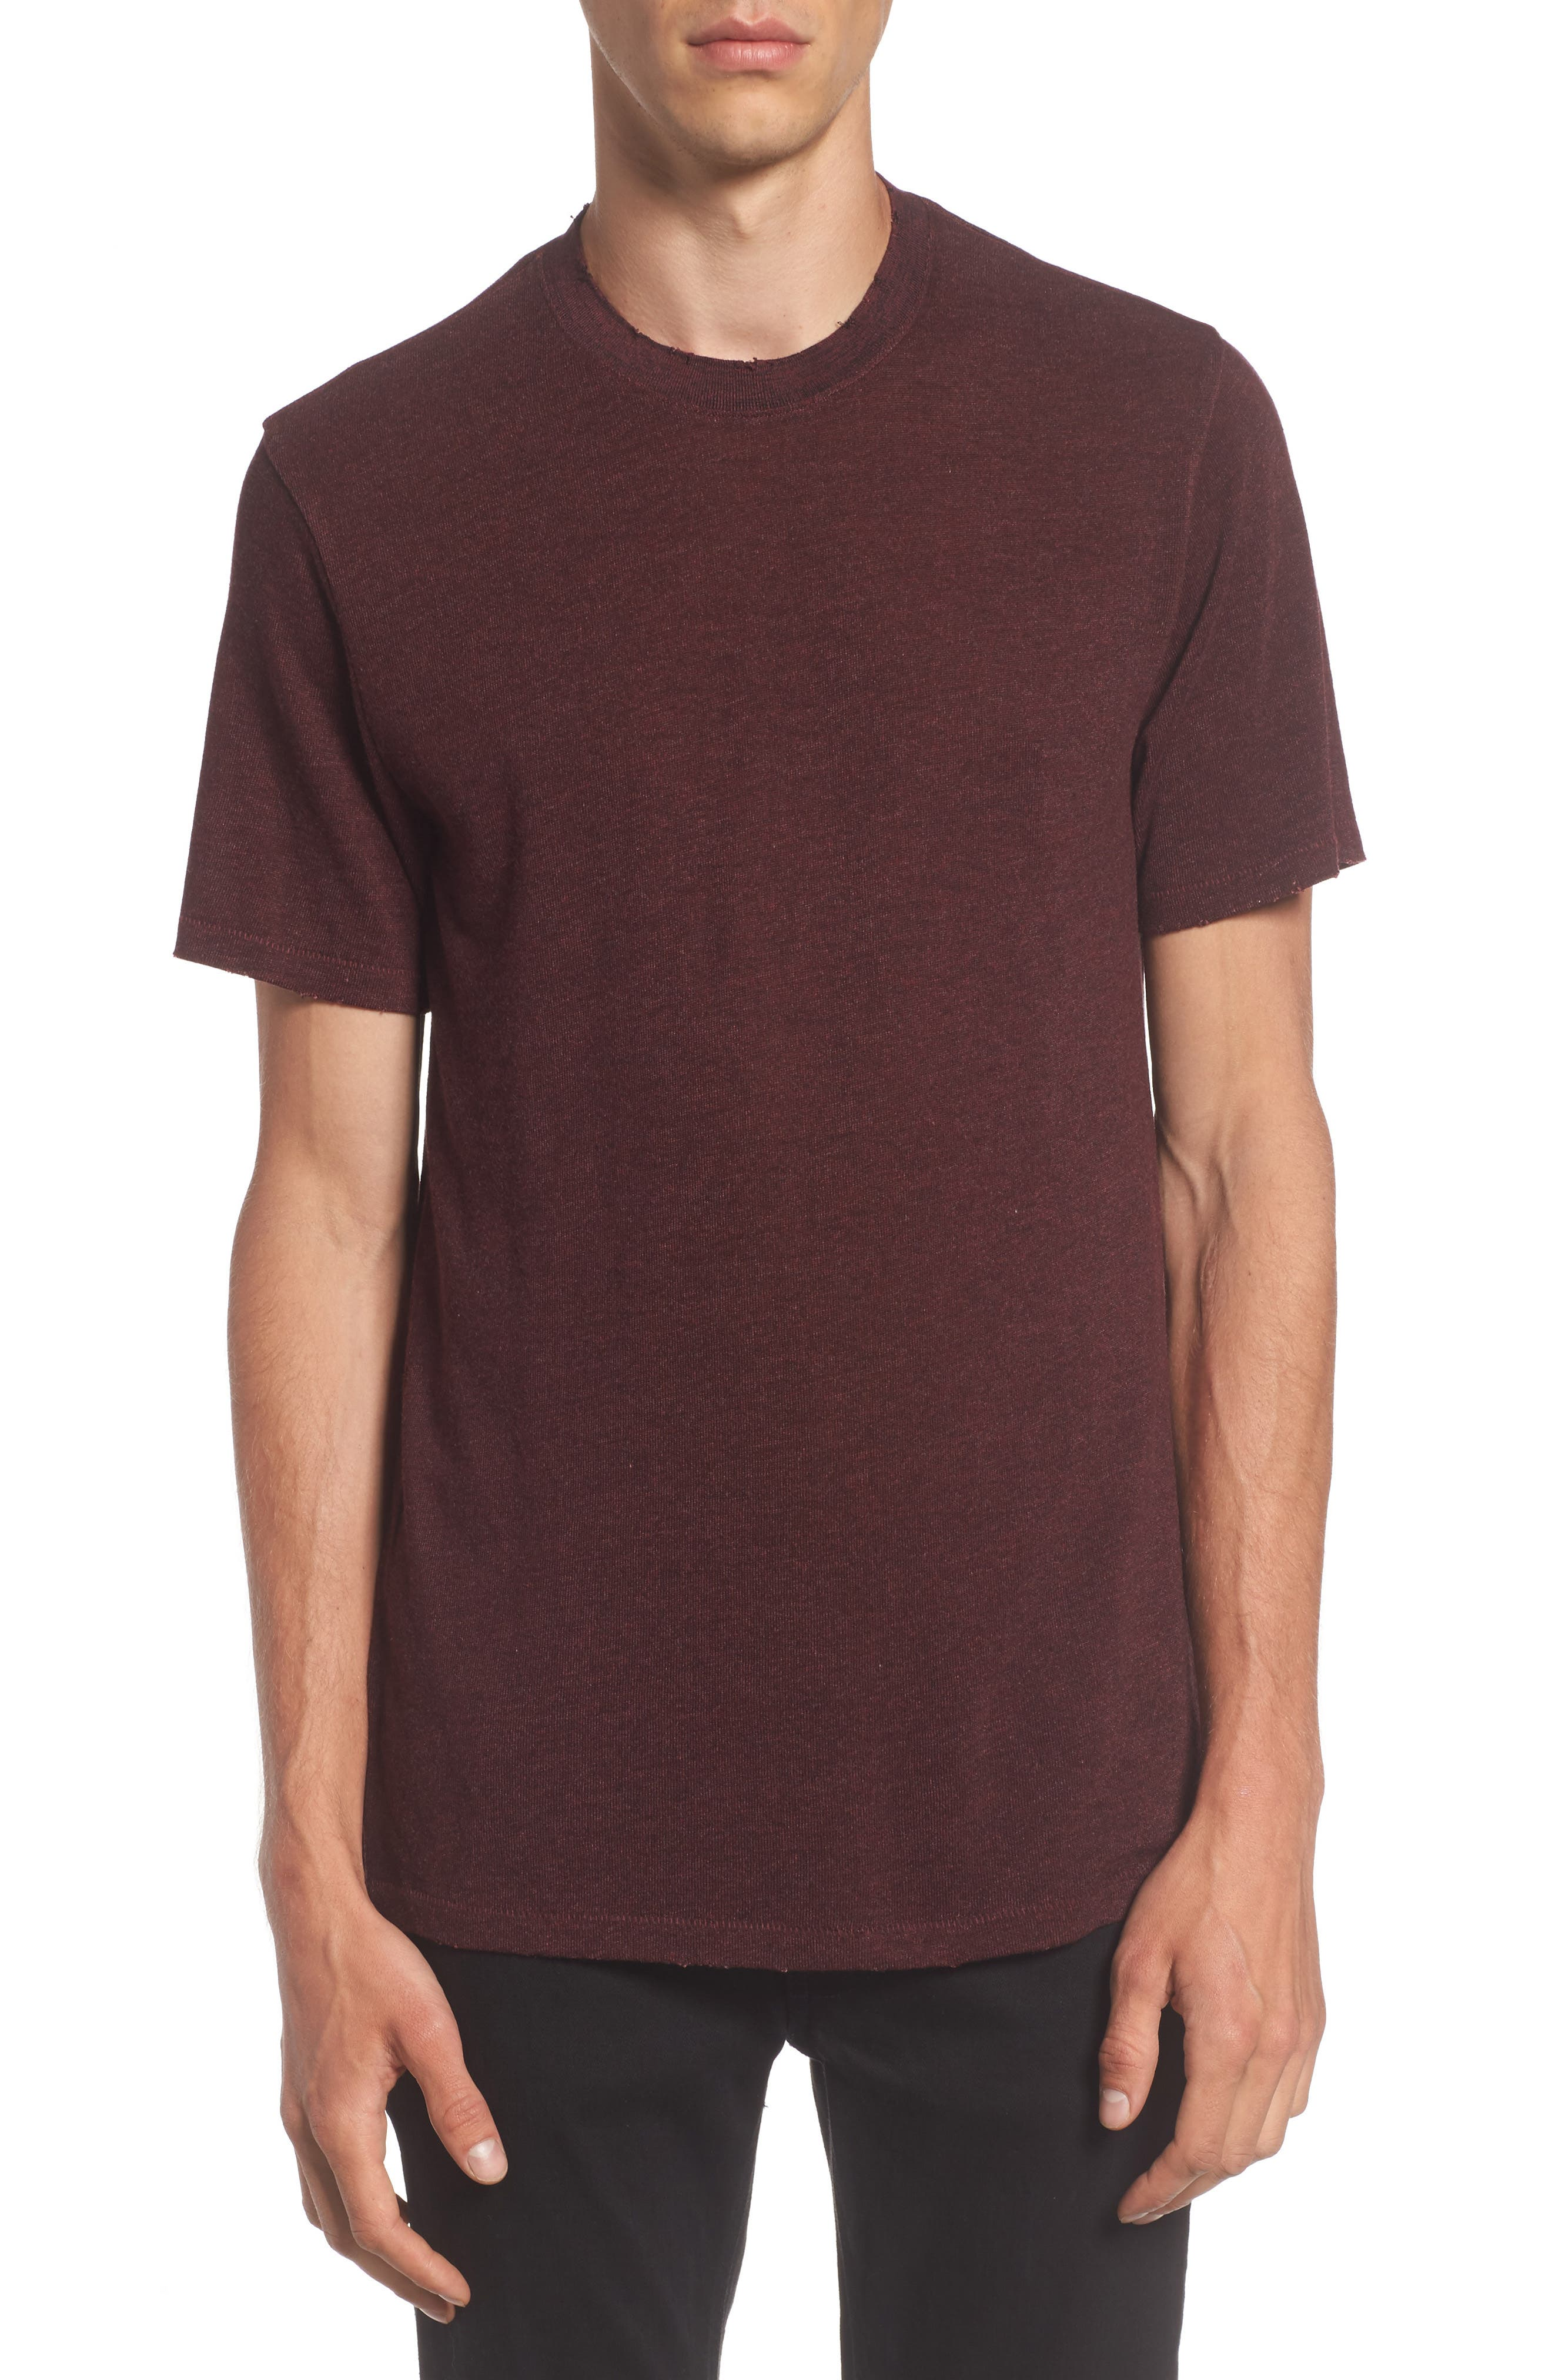 Alternate Image 1 Selected - Treasure & Bond Core Crewneck T-Shirt